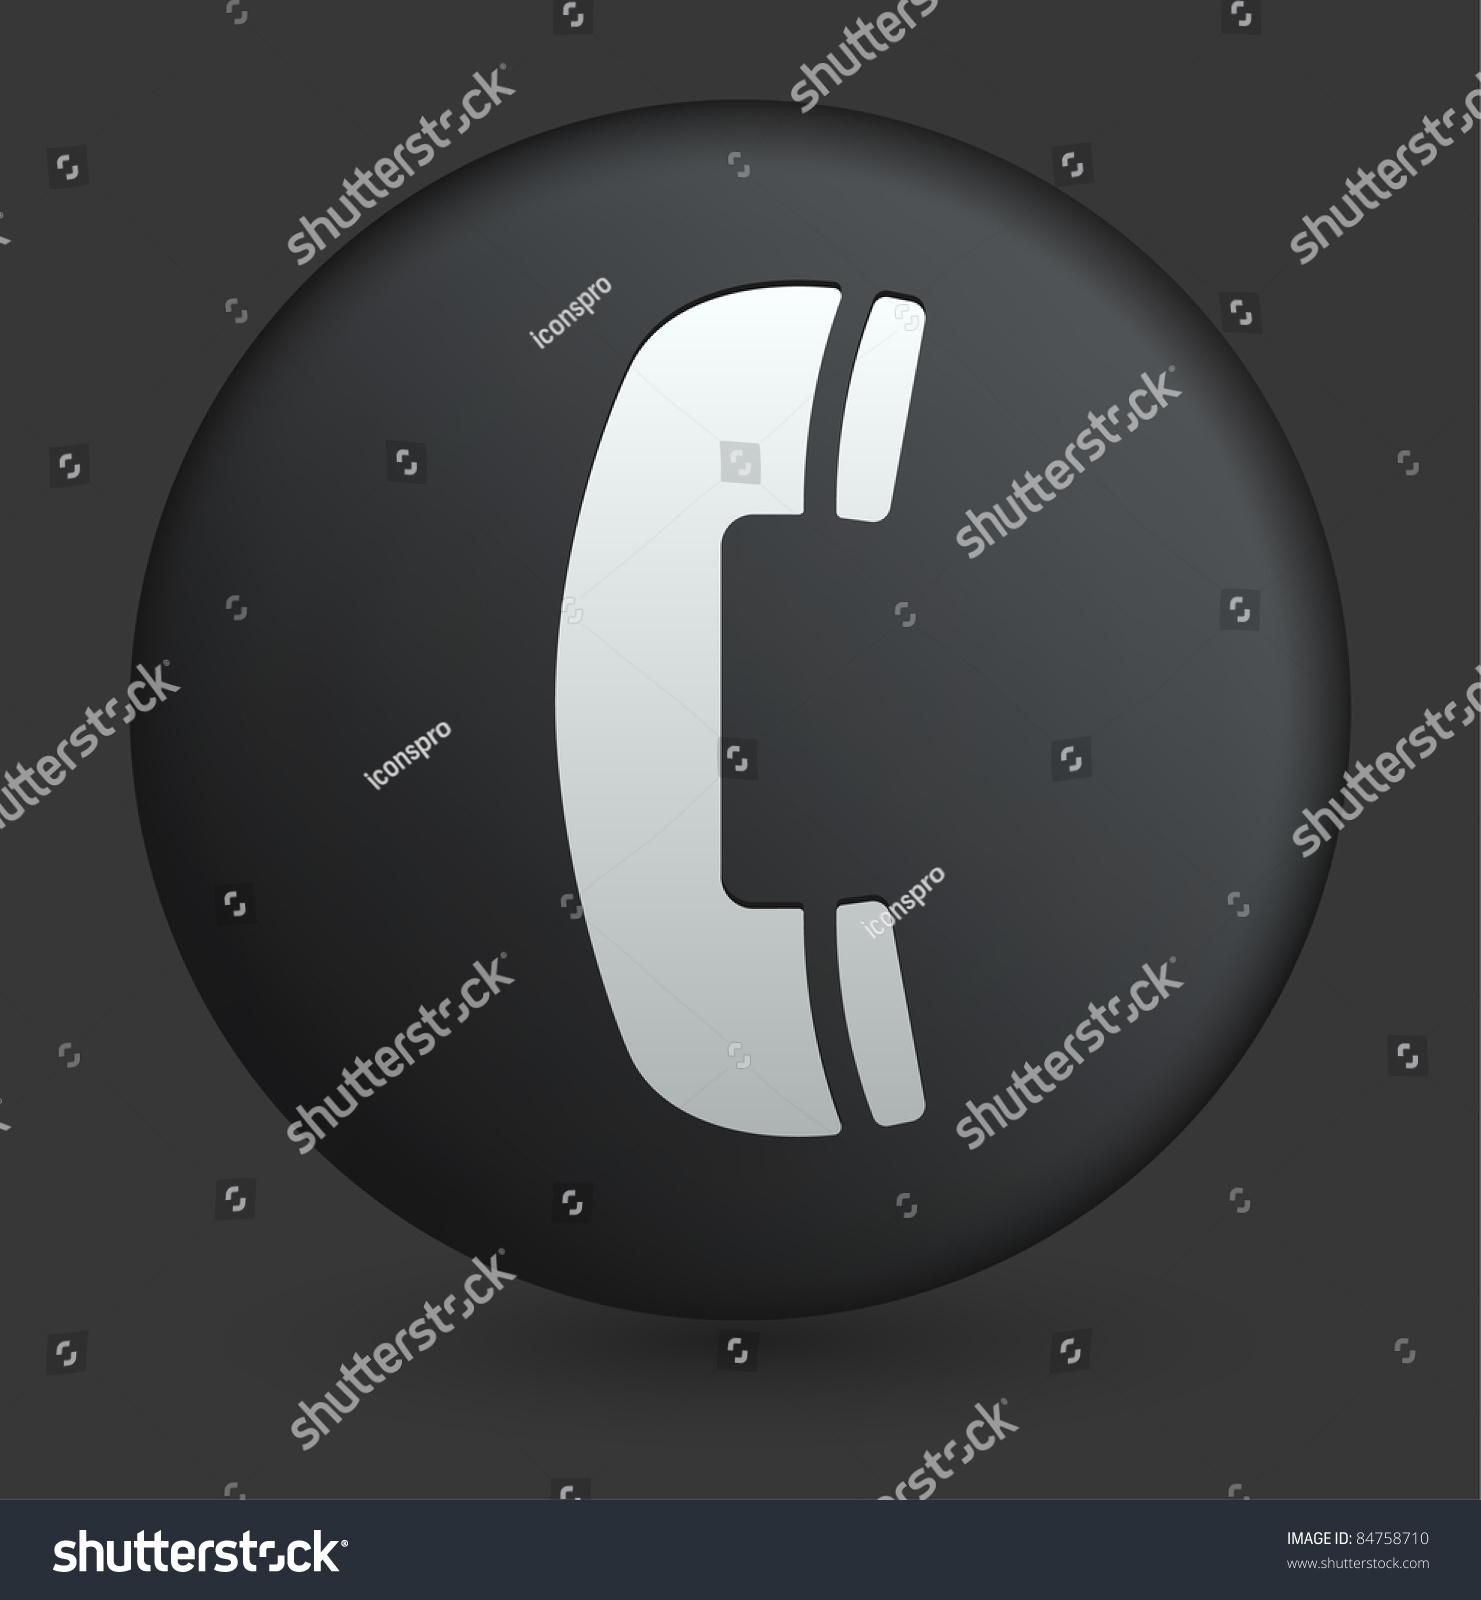 ppt符号素材按钮符号